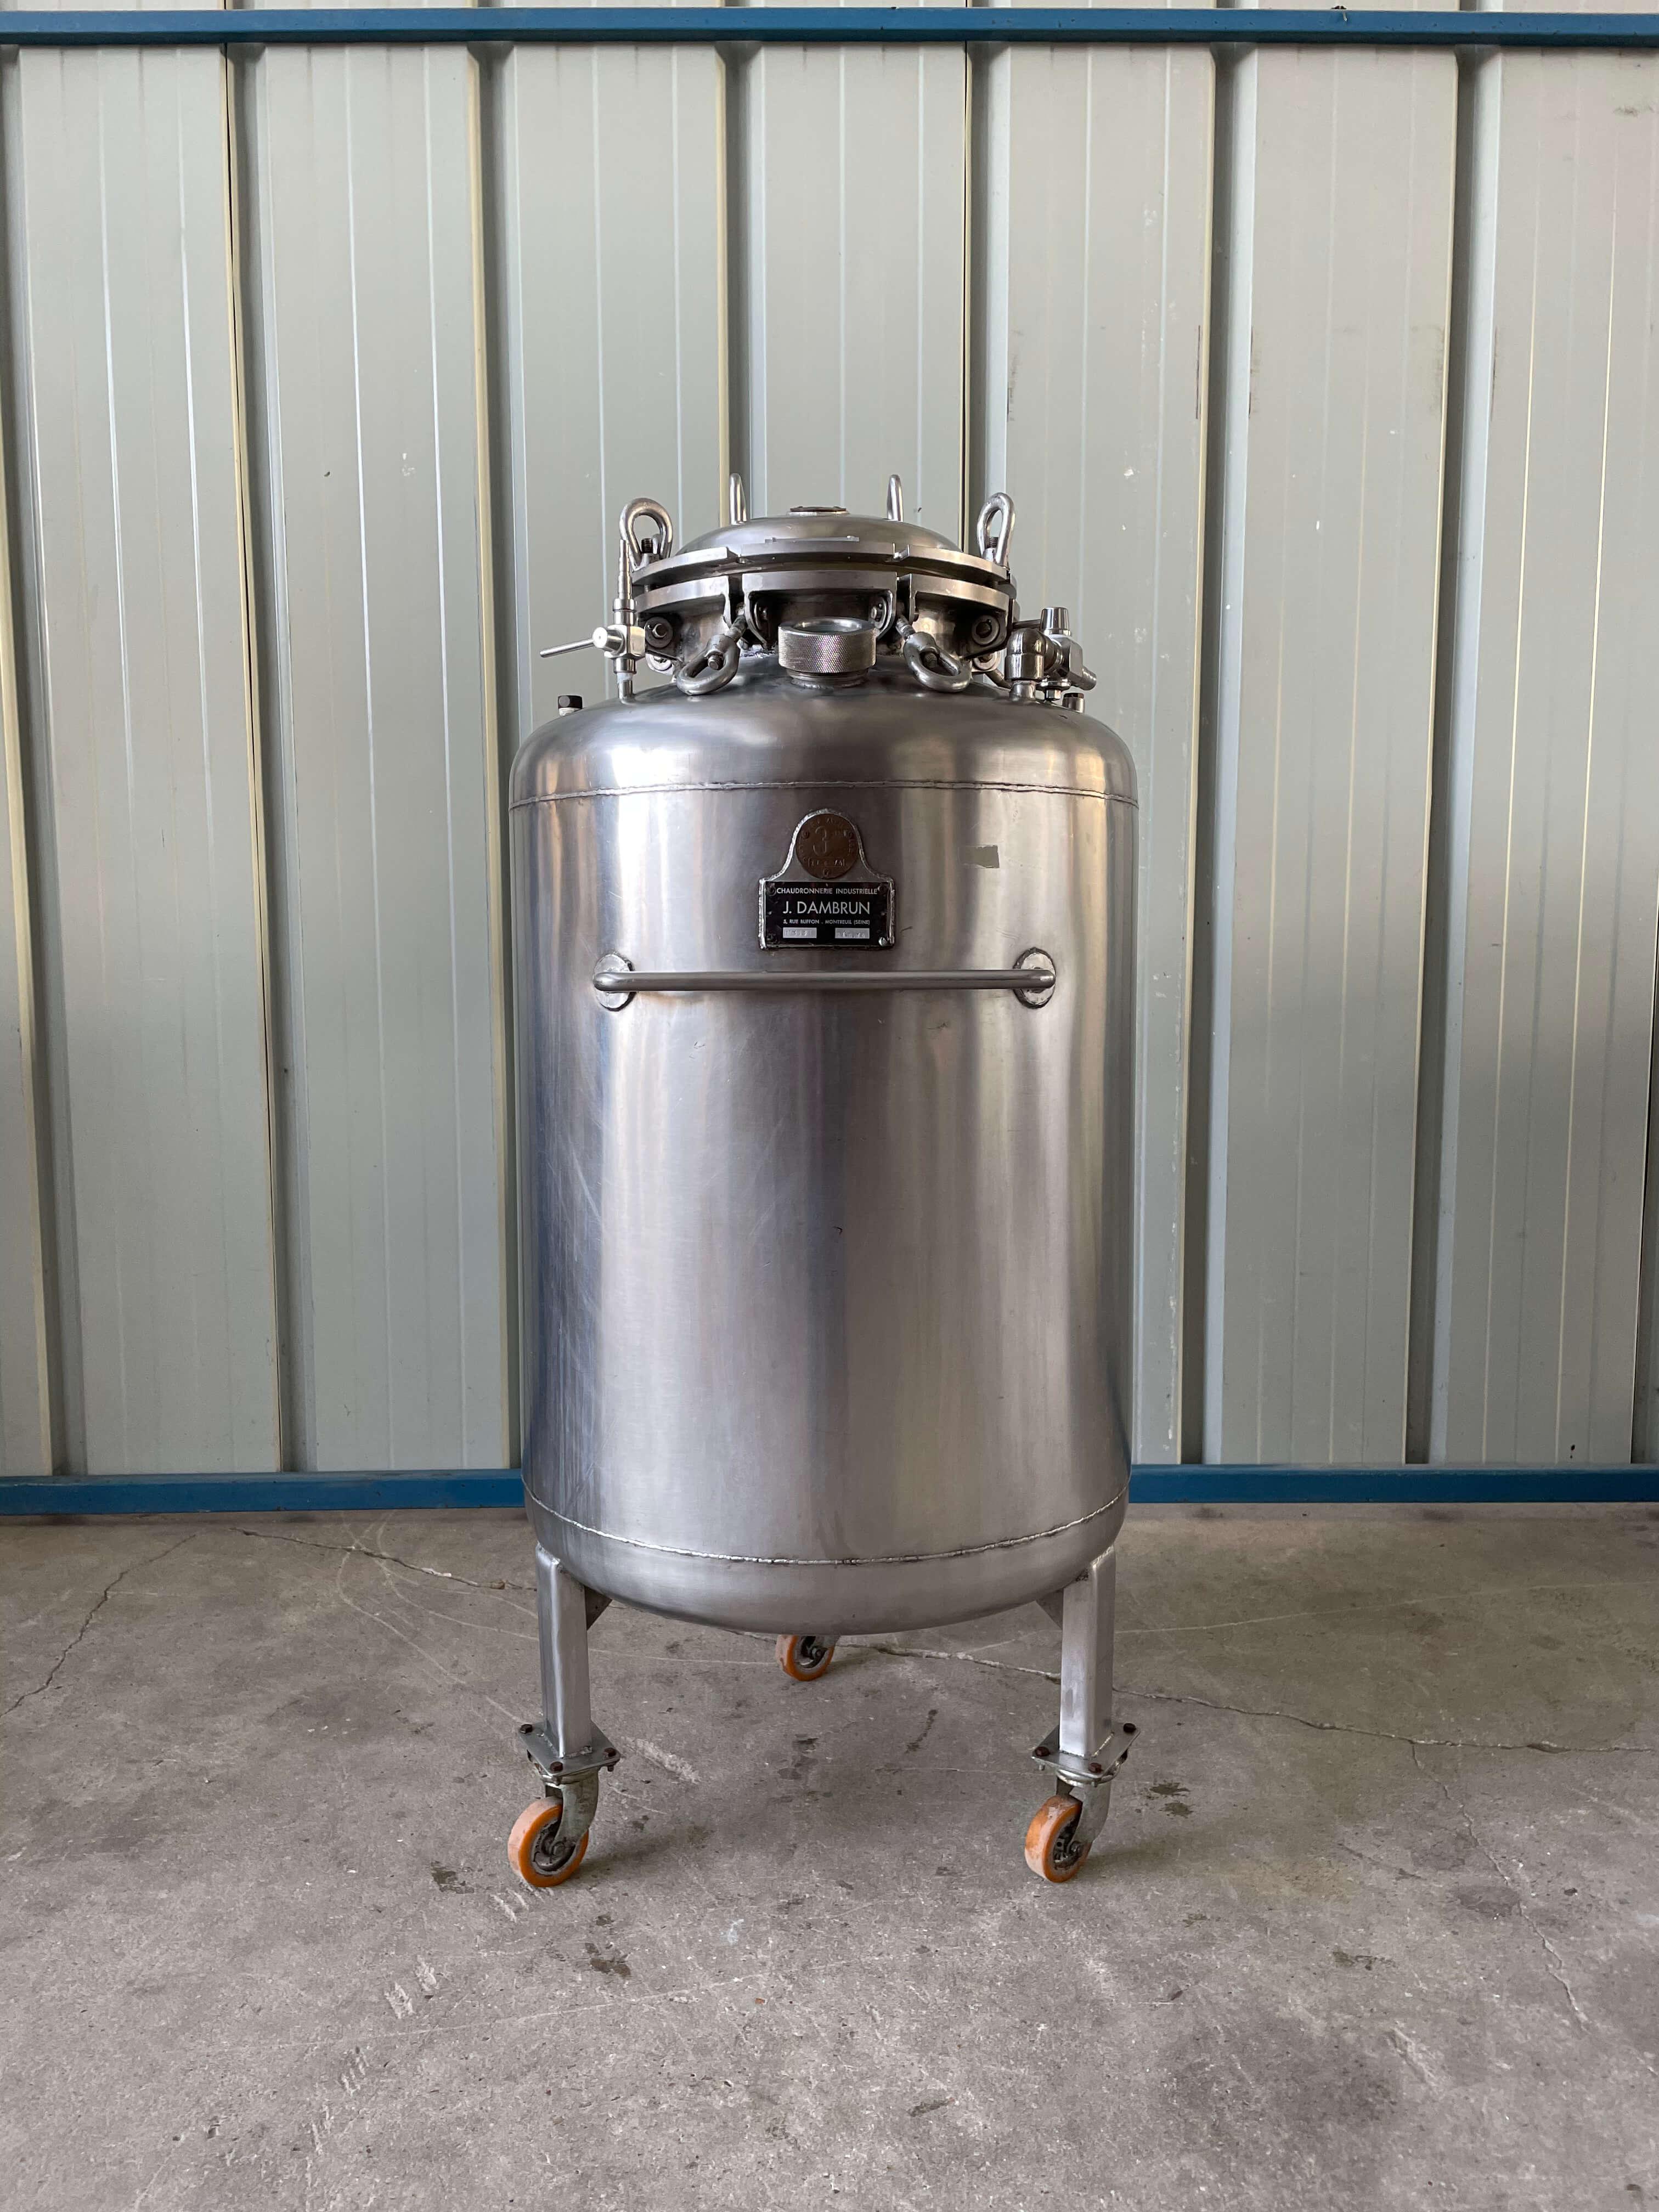 Dambron - Stainless steel tank 200L